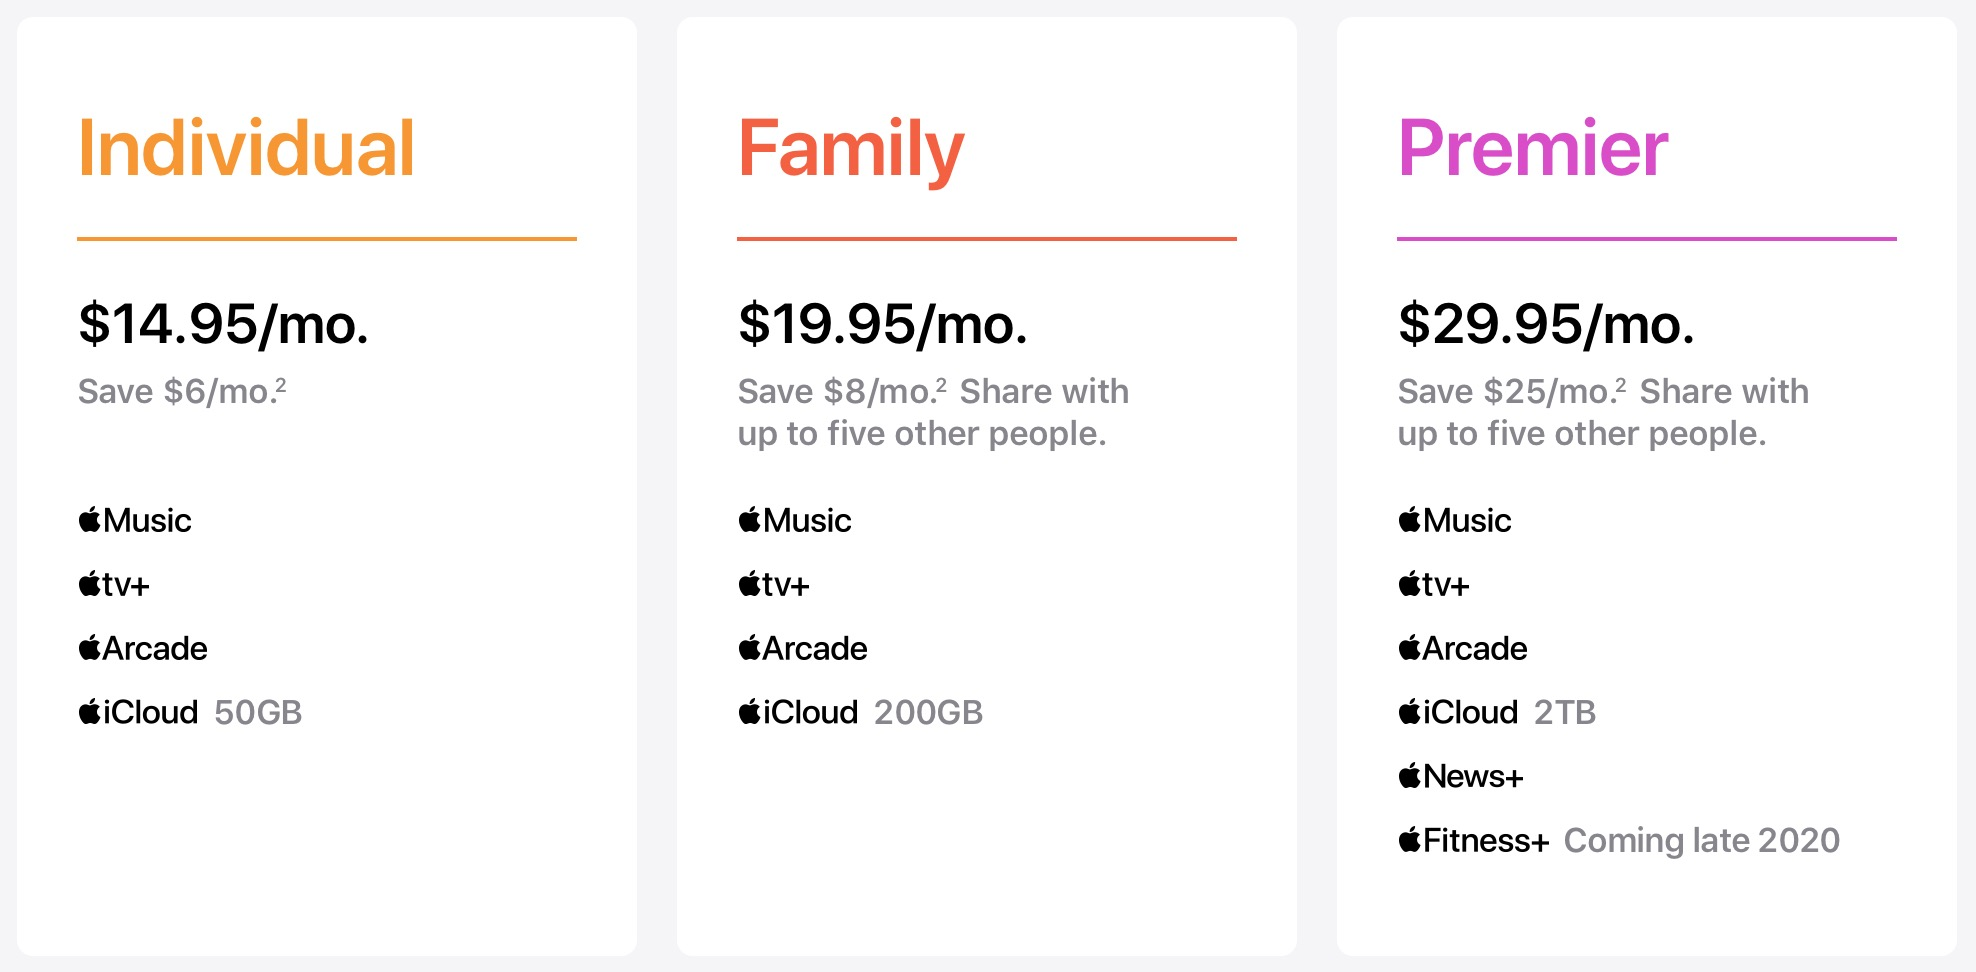 Apple One subscription bundle plans - pricing